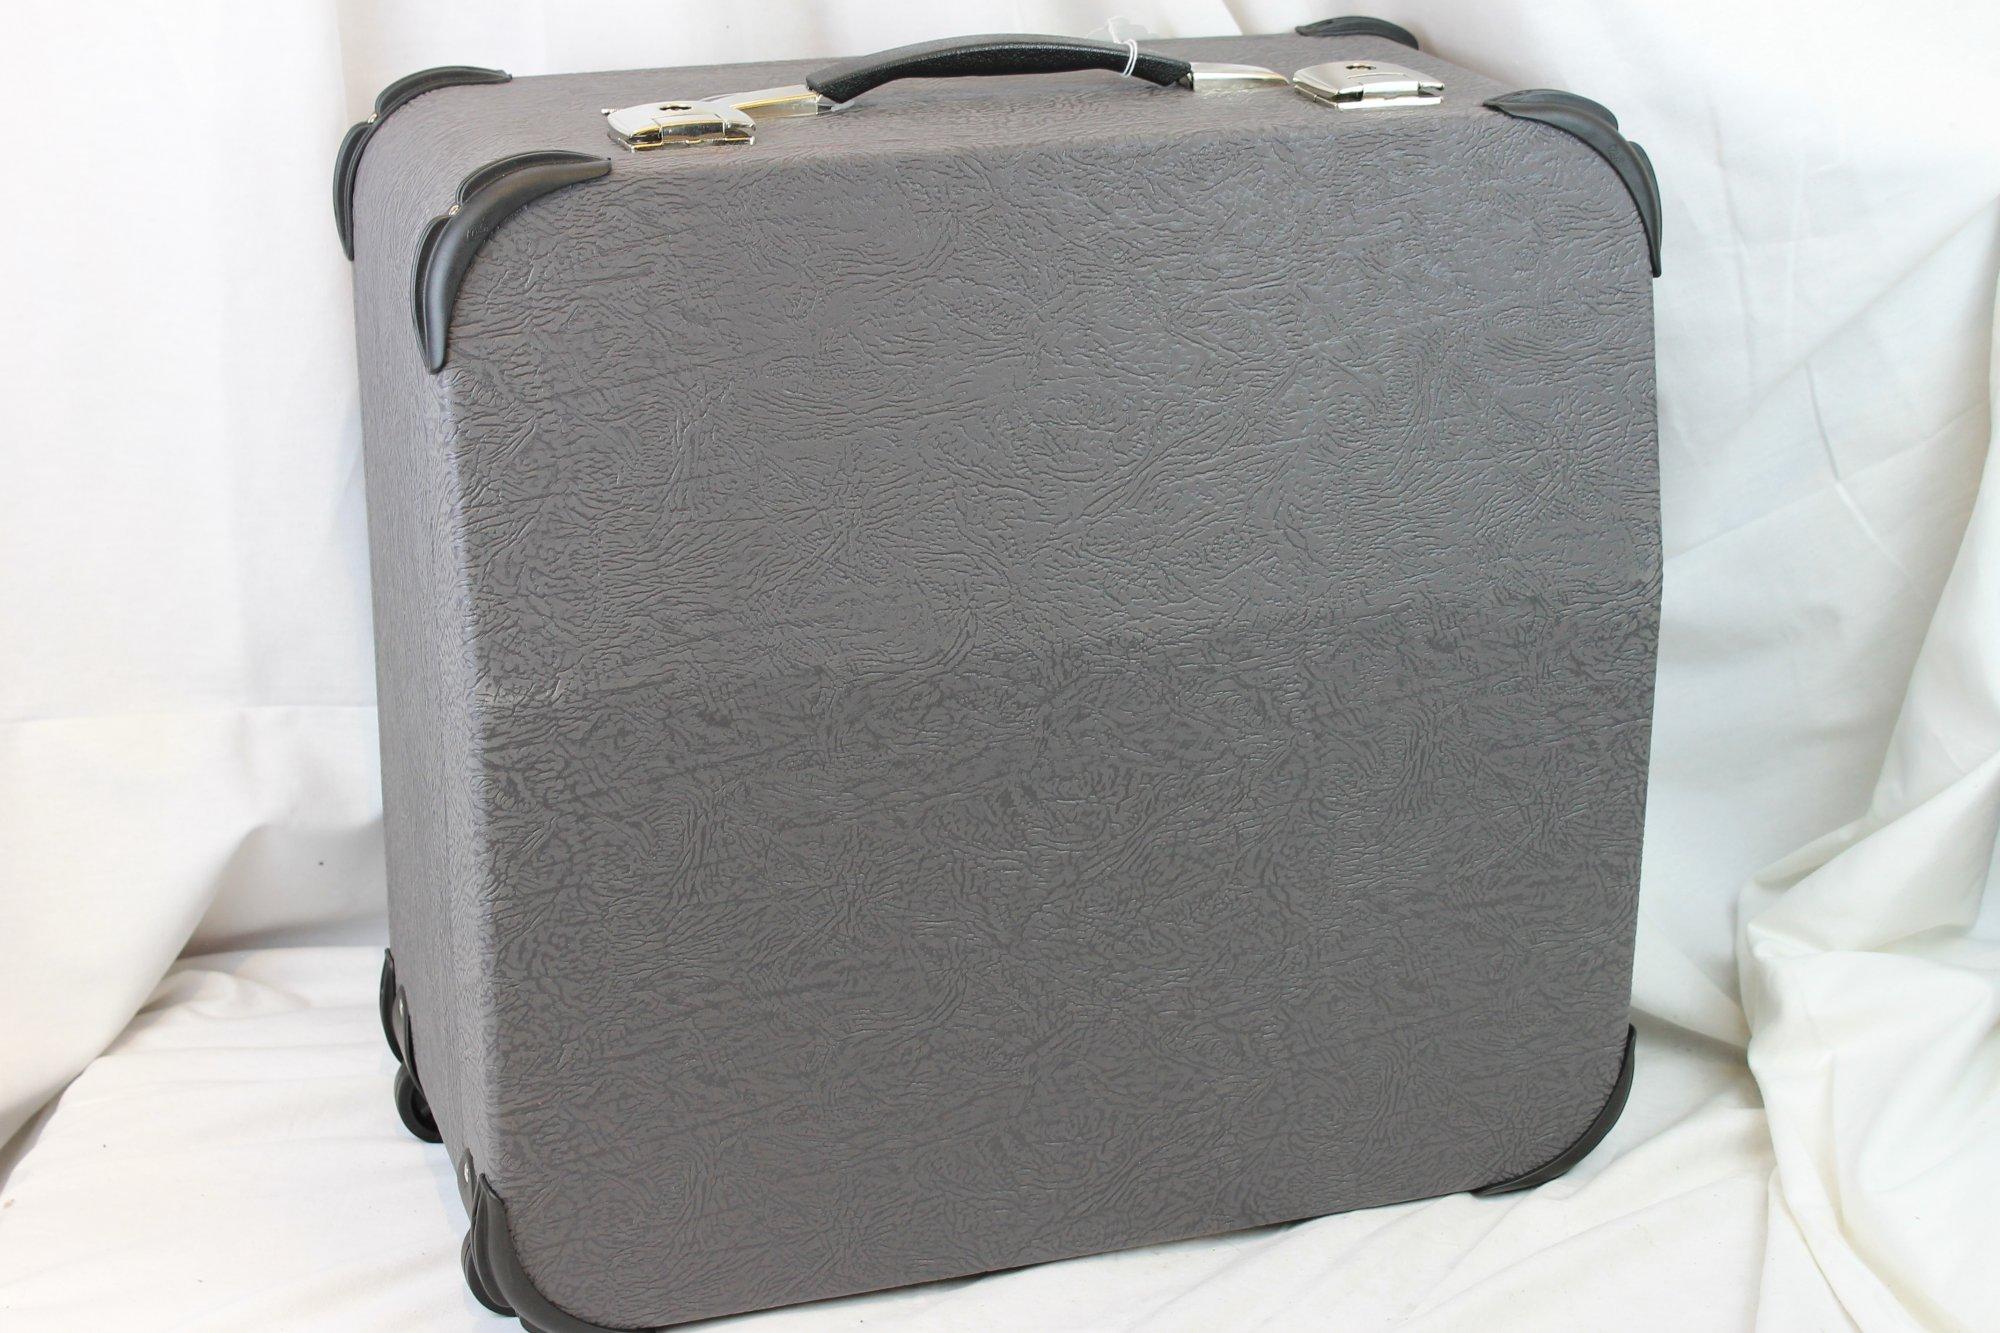 NEW Gray Brandoni Accordion Hard Case with Wheels 19.75 x 19 x 9.5 (50cm x 48cm x  24cm)